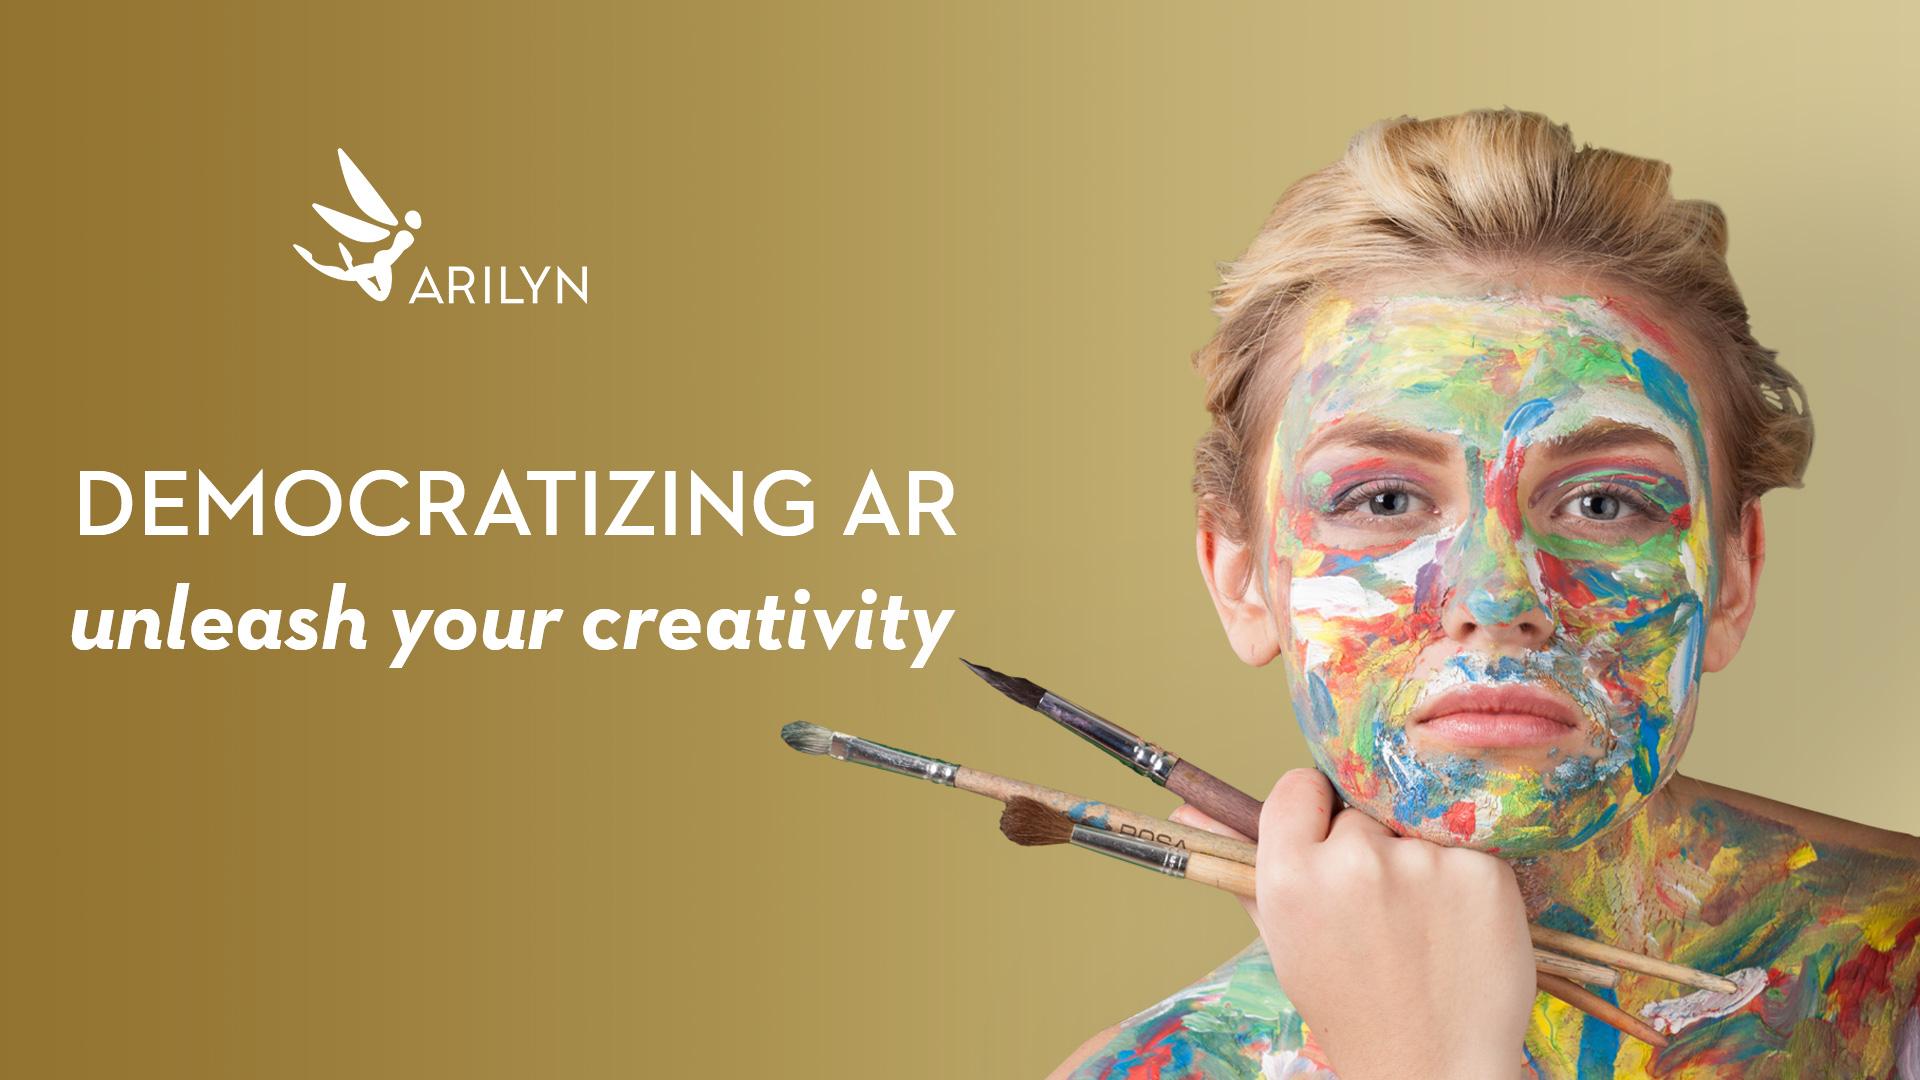 Democratizing augmented reality - unleash your creativity